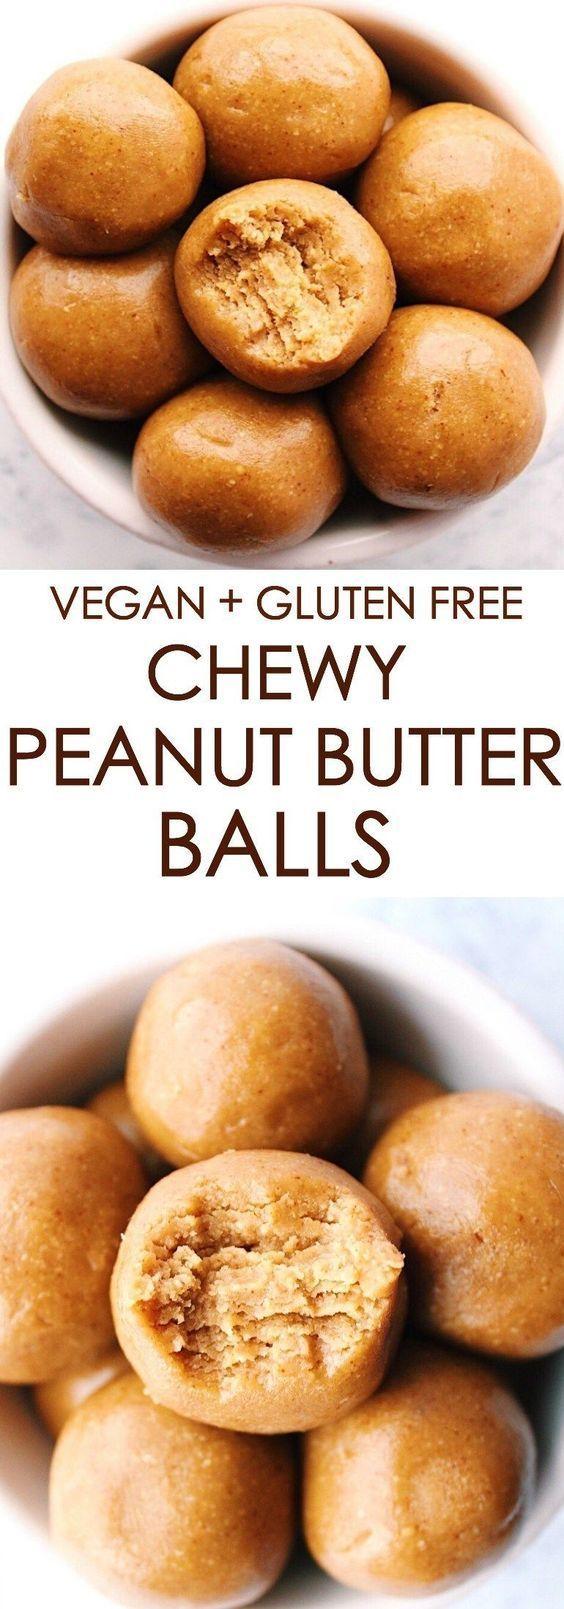 CHEWY PEANUT BUTTER BALLS {vegan, gluten free} – Gina Burgess Nutrition